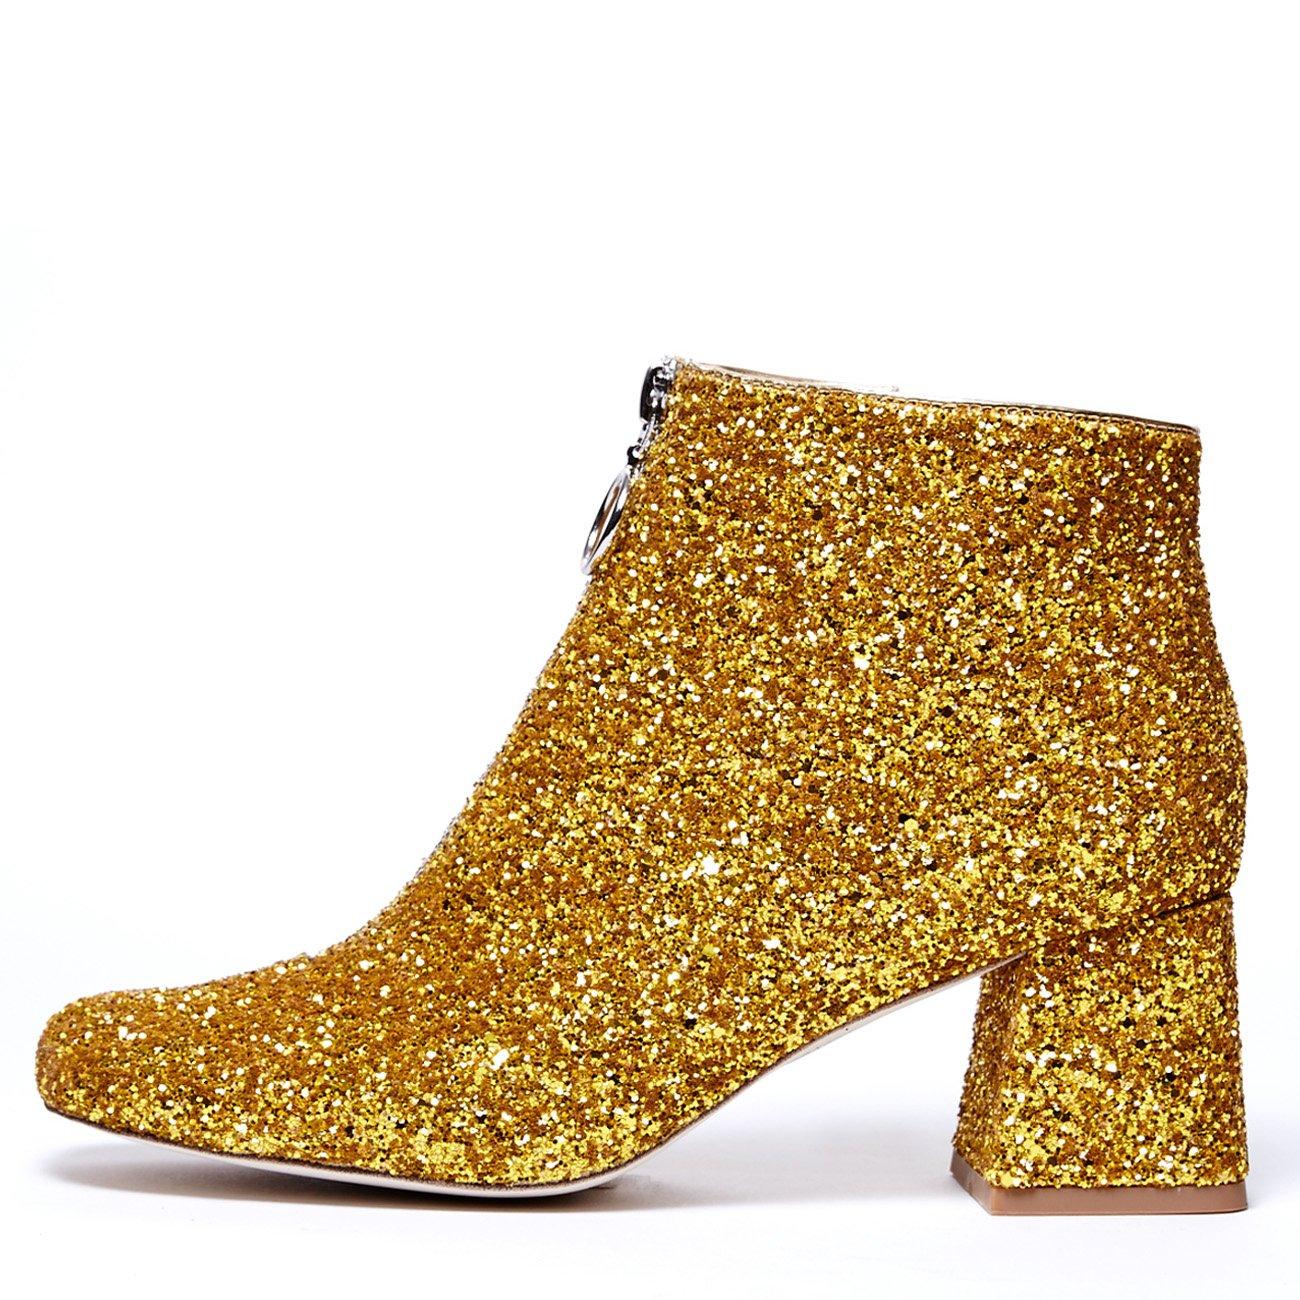 Jeffrey Campbell 'Bossanova' gold glitter boot,7 by Jeffrey Campbell